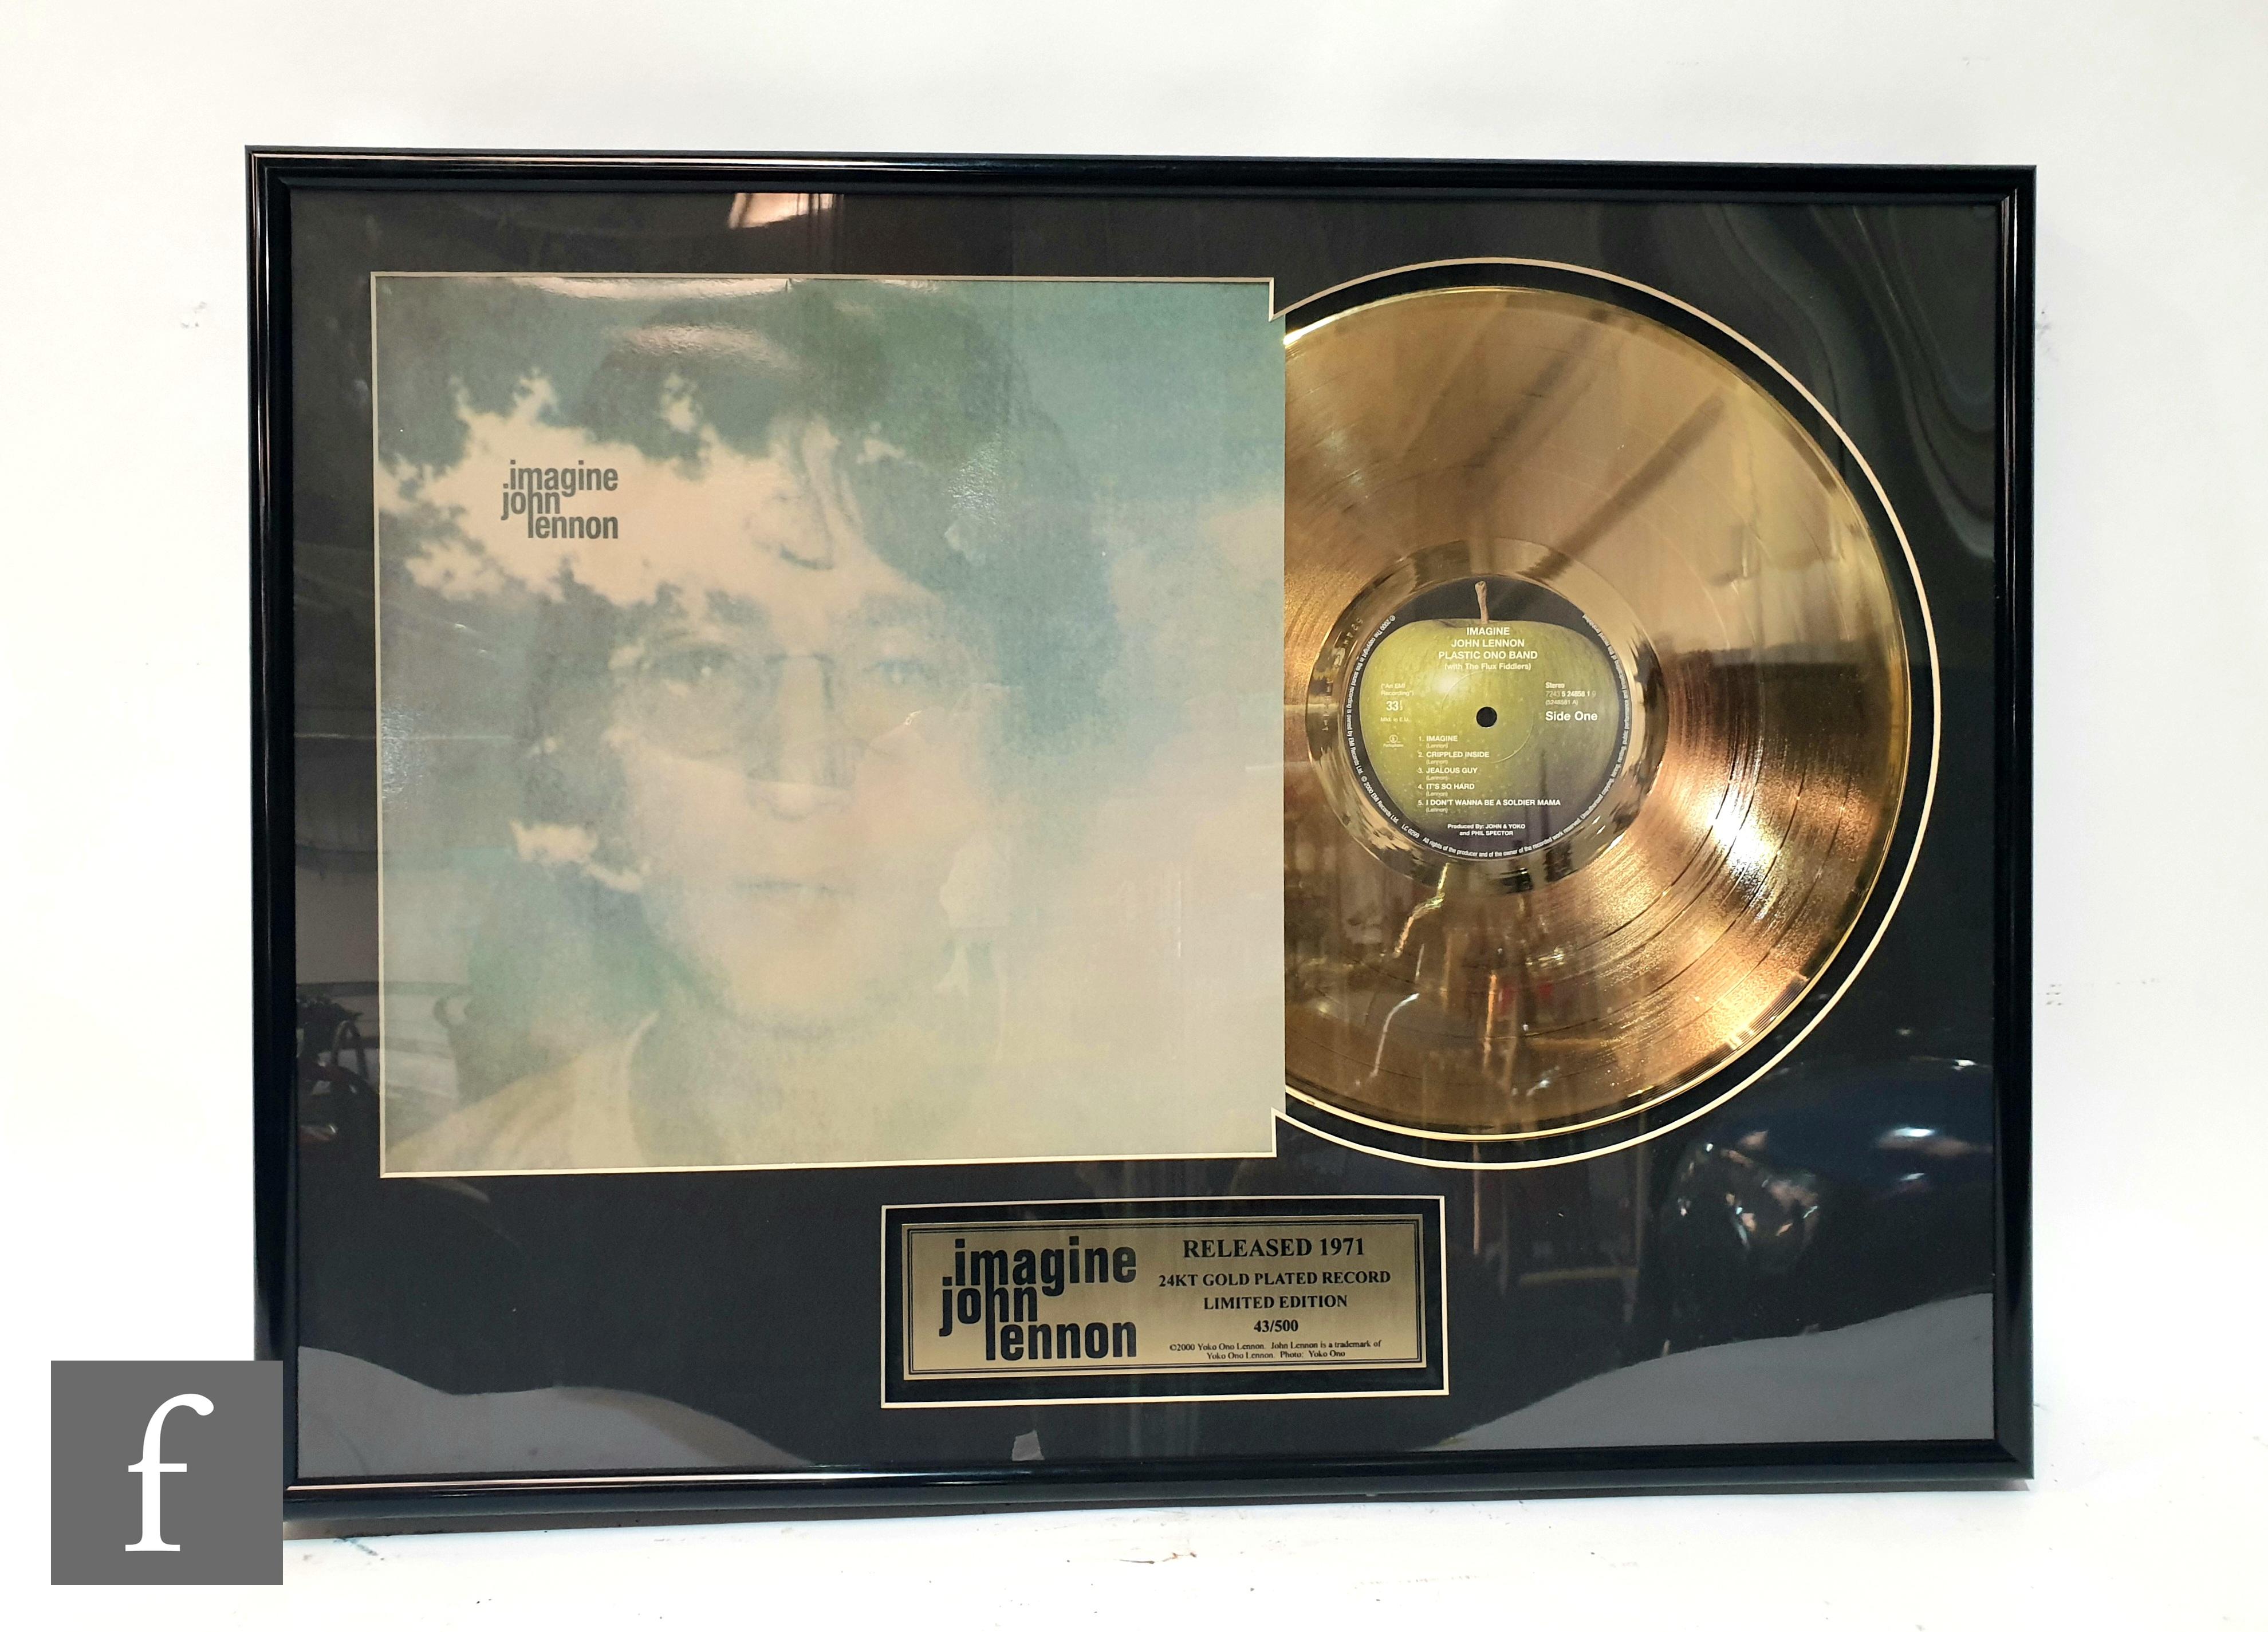 A limited edition John Lennon 24 carat gold plated Imagine framed presentation montage, edition